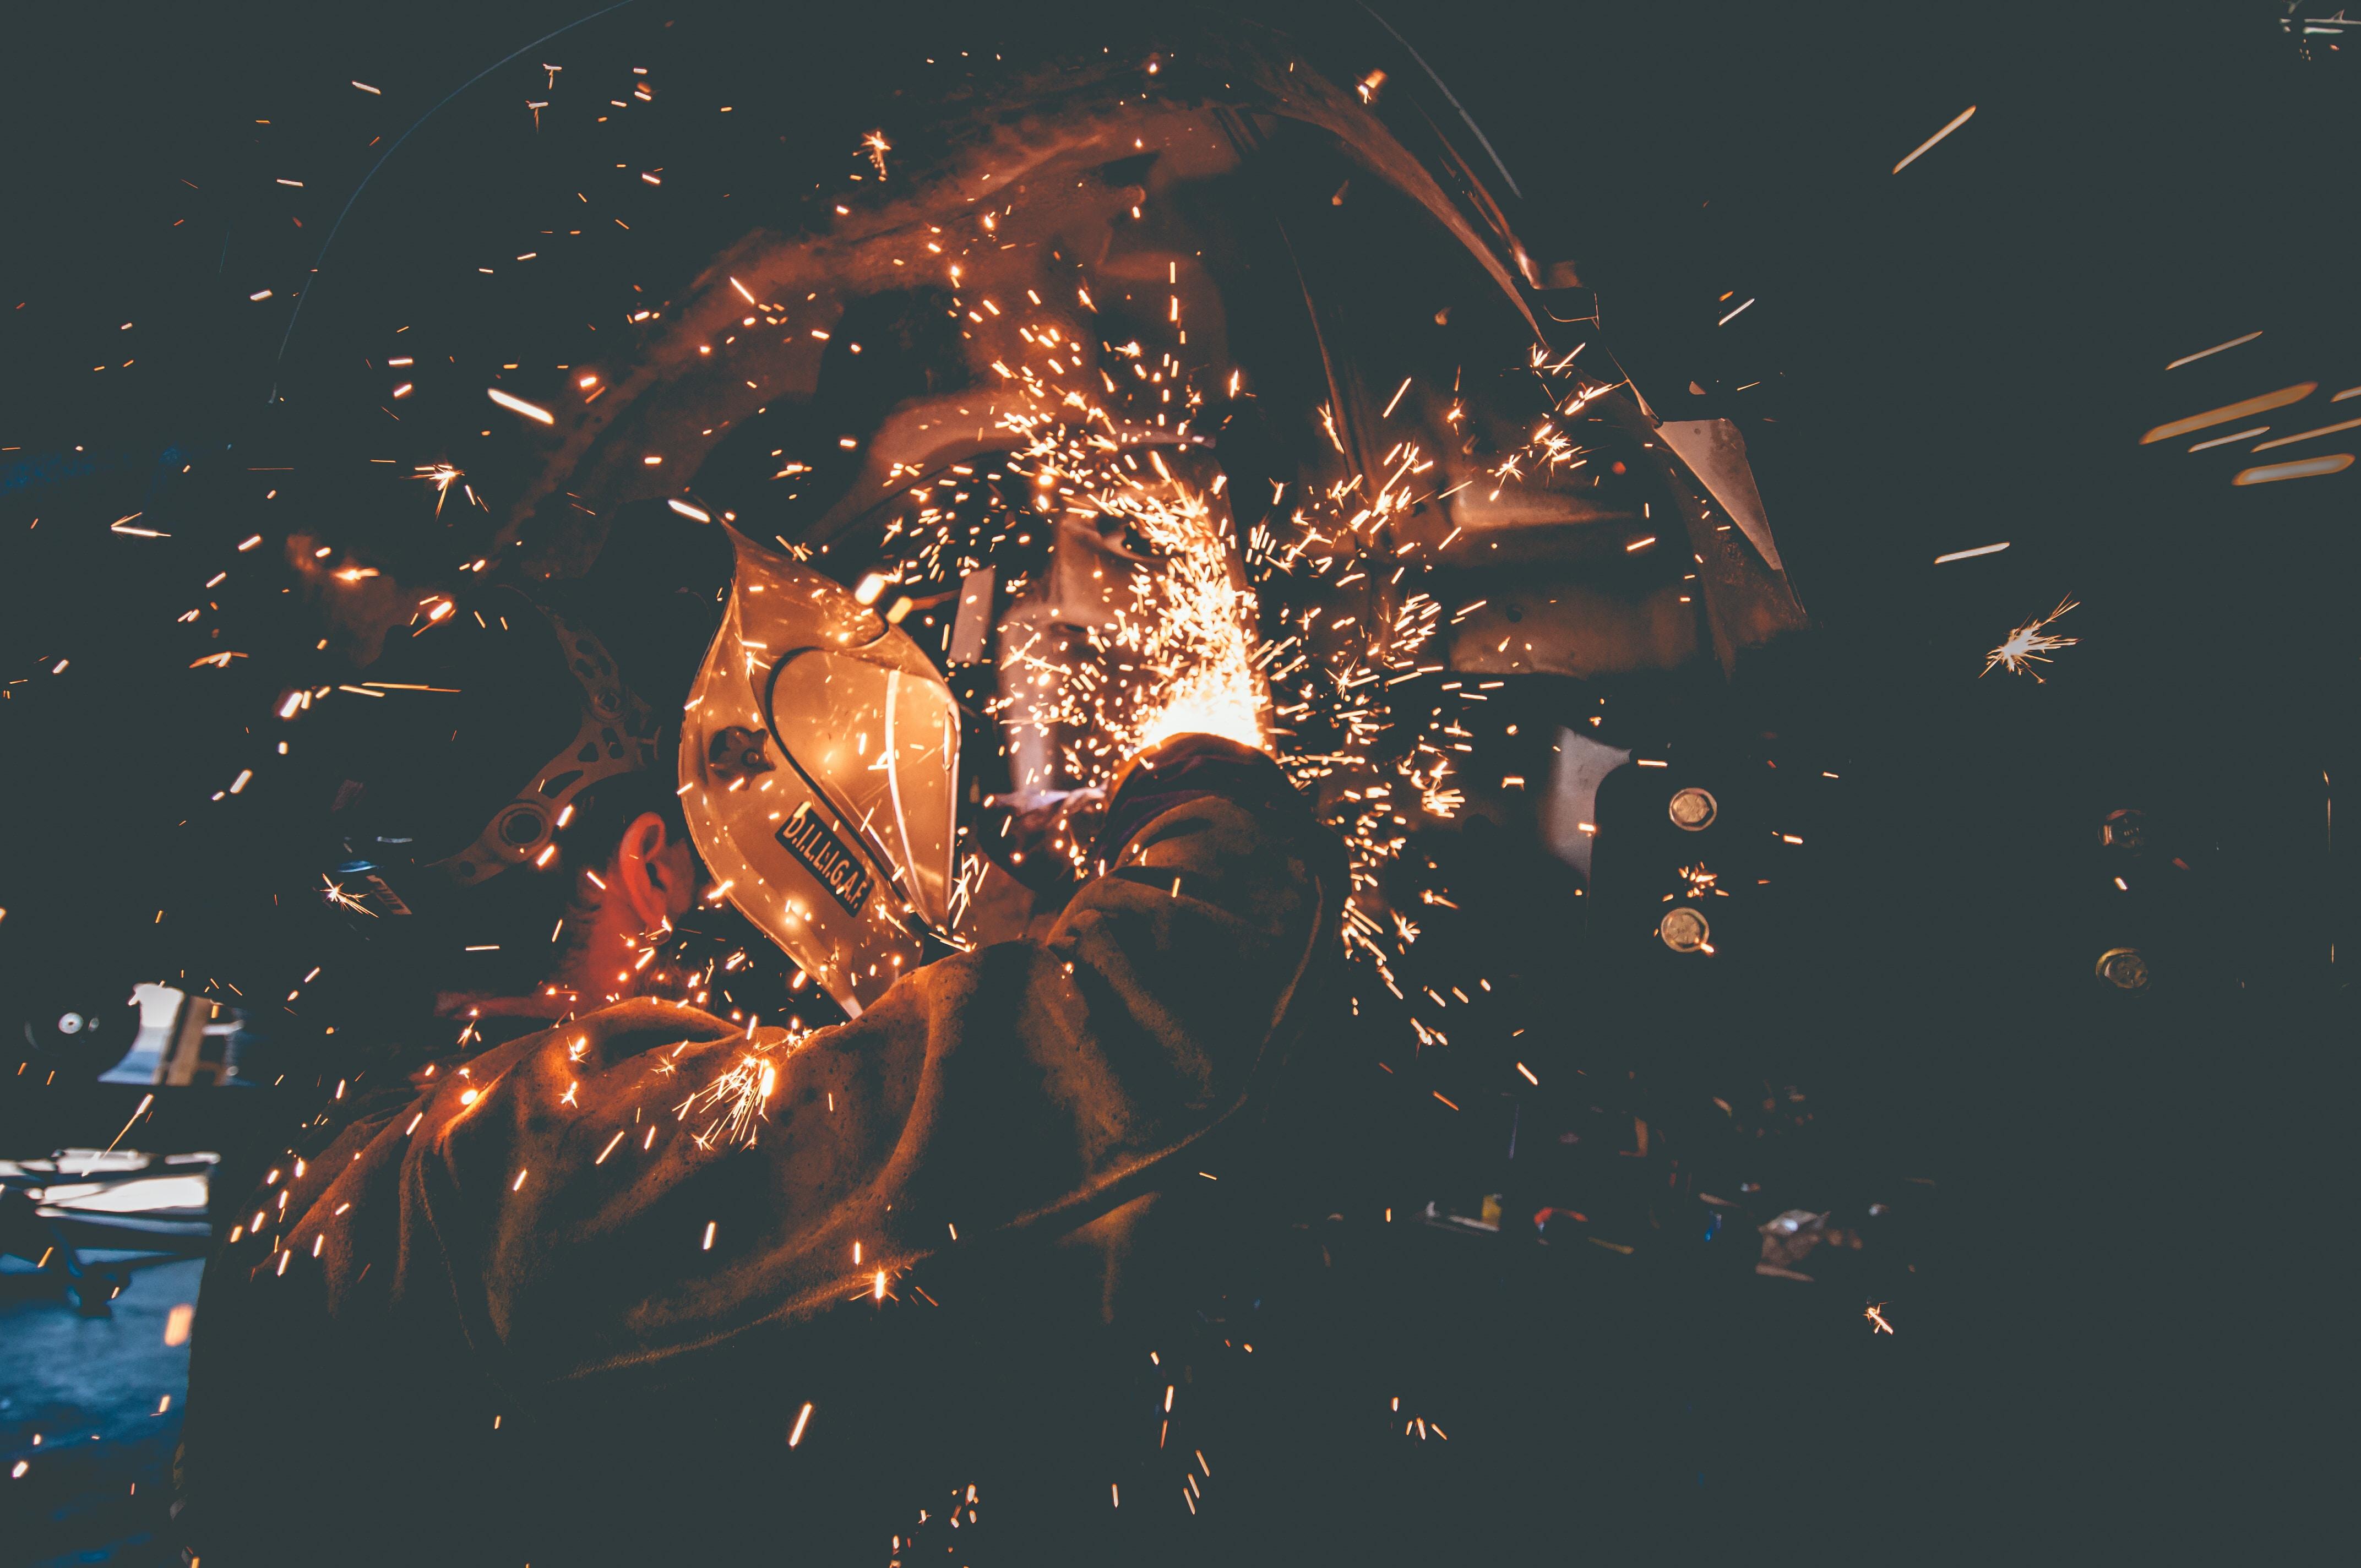 man wearing welding mask grinding metal